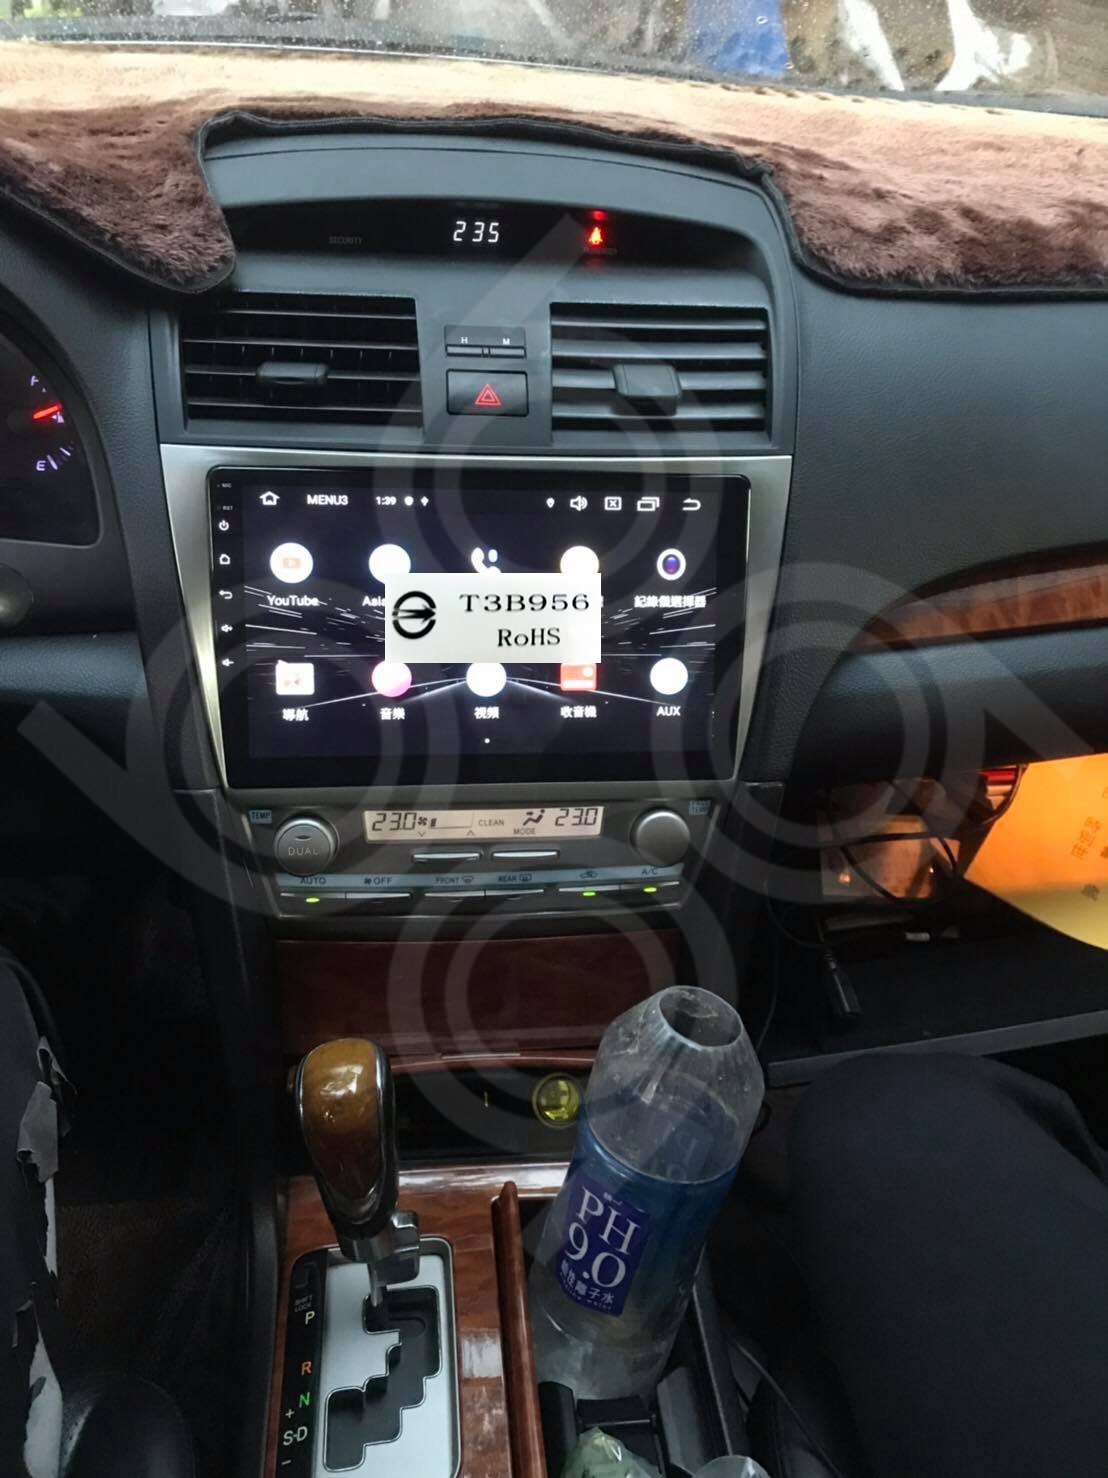 Toyota camry 10吋安卓專用機+360度環景.九九汽車音響公司貨保固一年